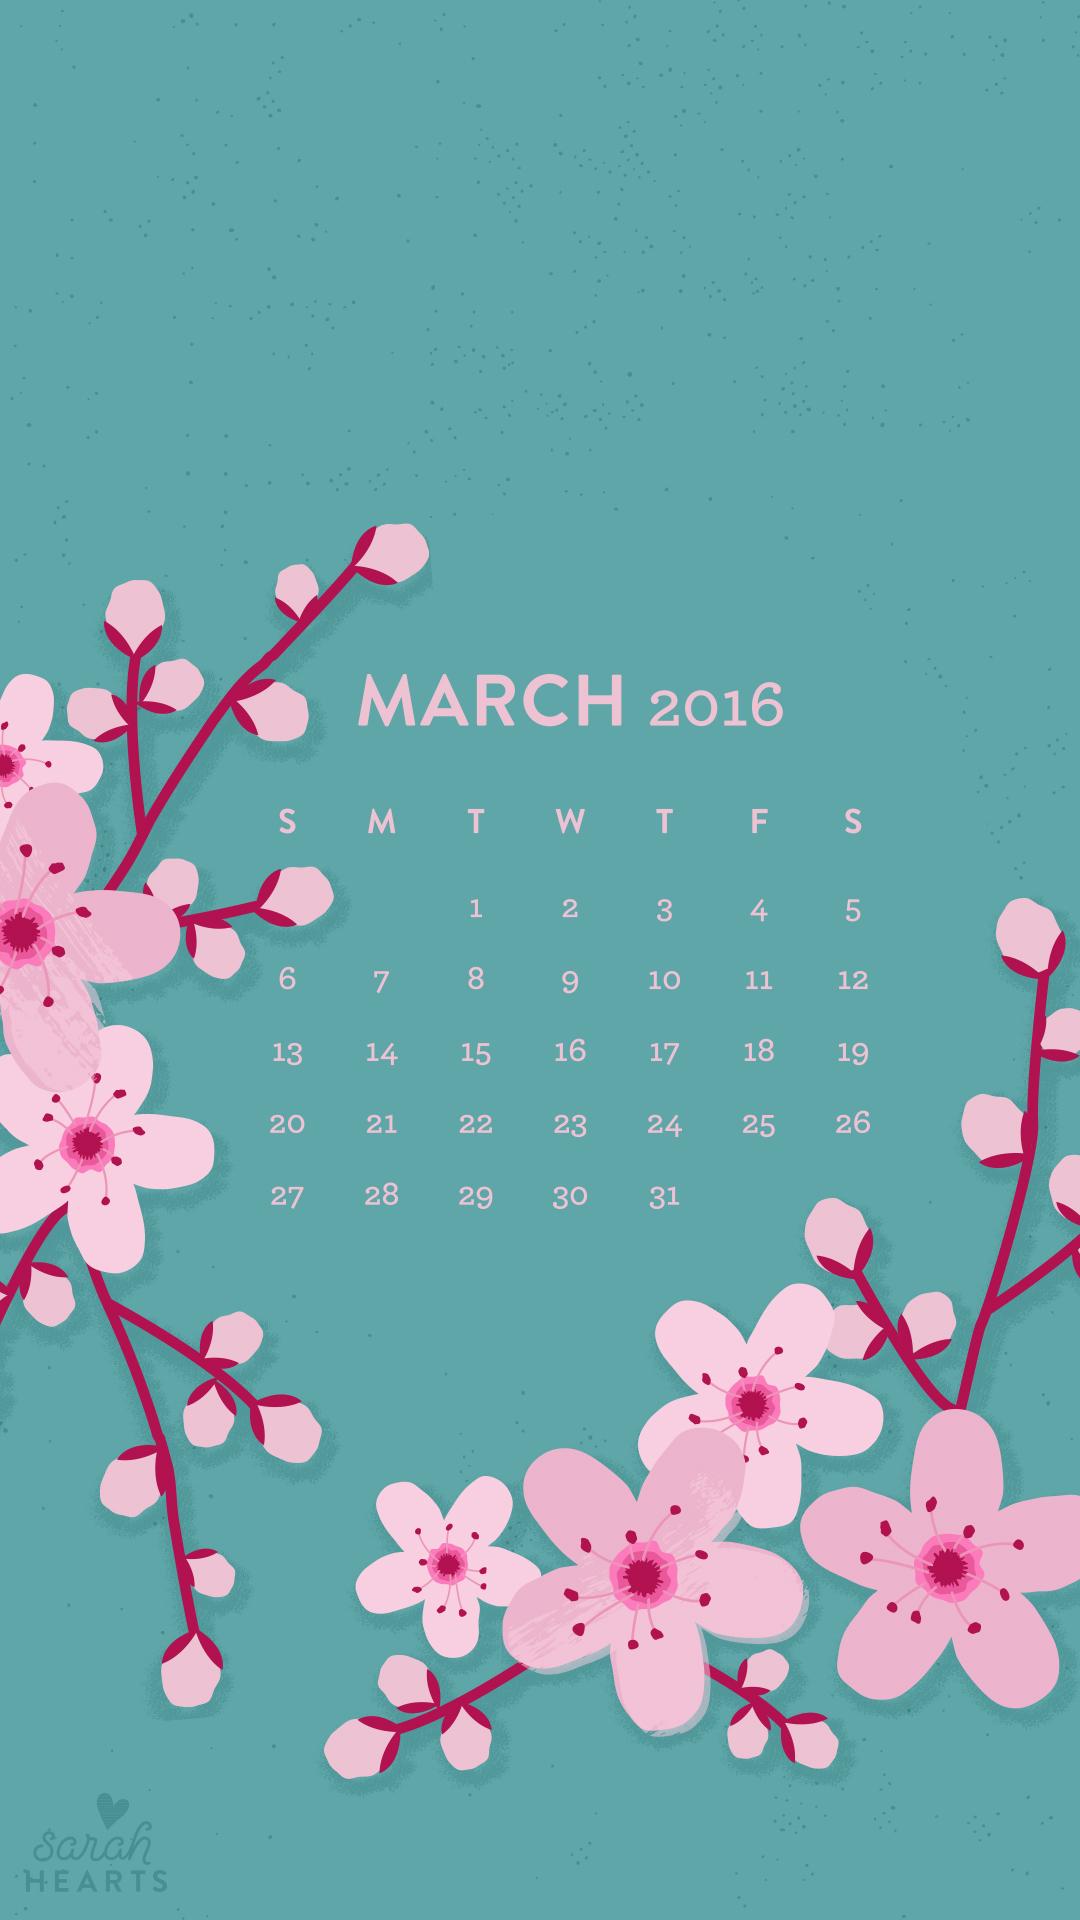 Calendar Iphone Wallpaper : Iphone calendar g pixels